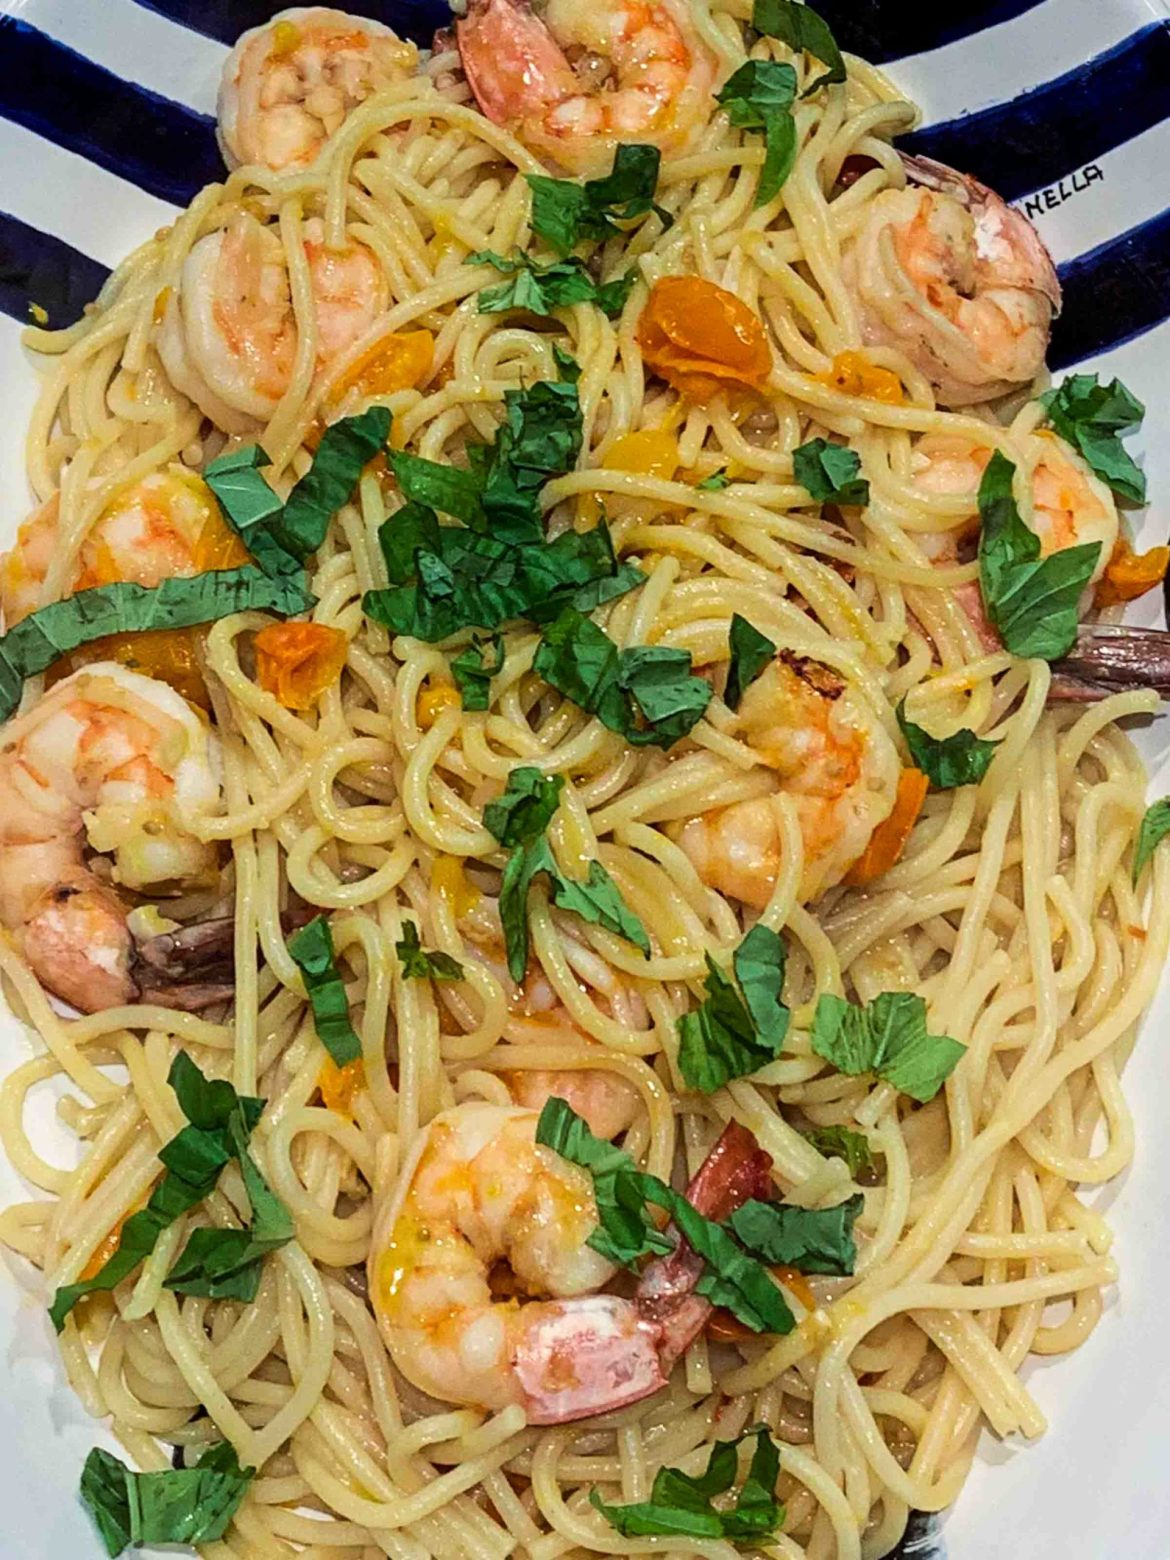 Italian shrimp pasta with cherry tomatoes and basil | thetasteedit.com #recipe #pasta #italian